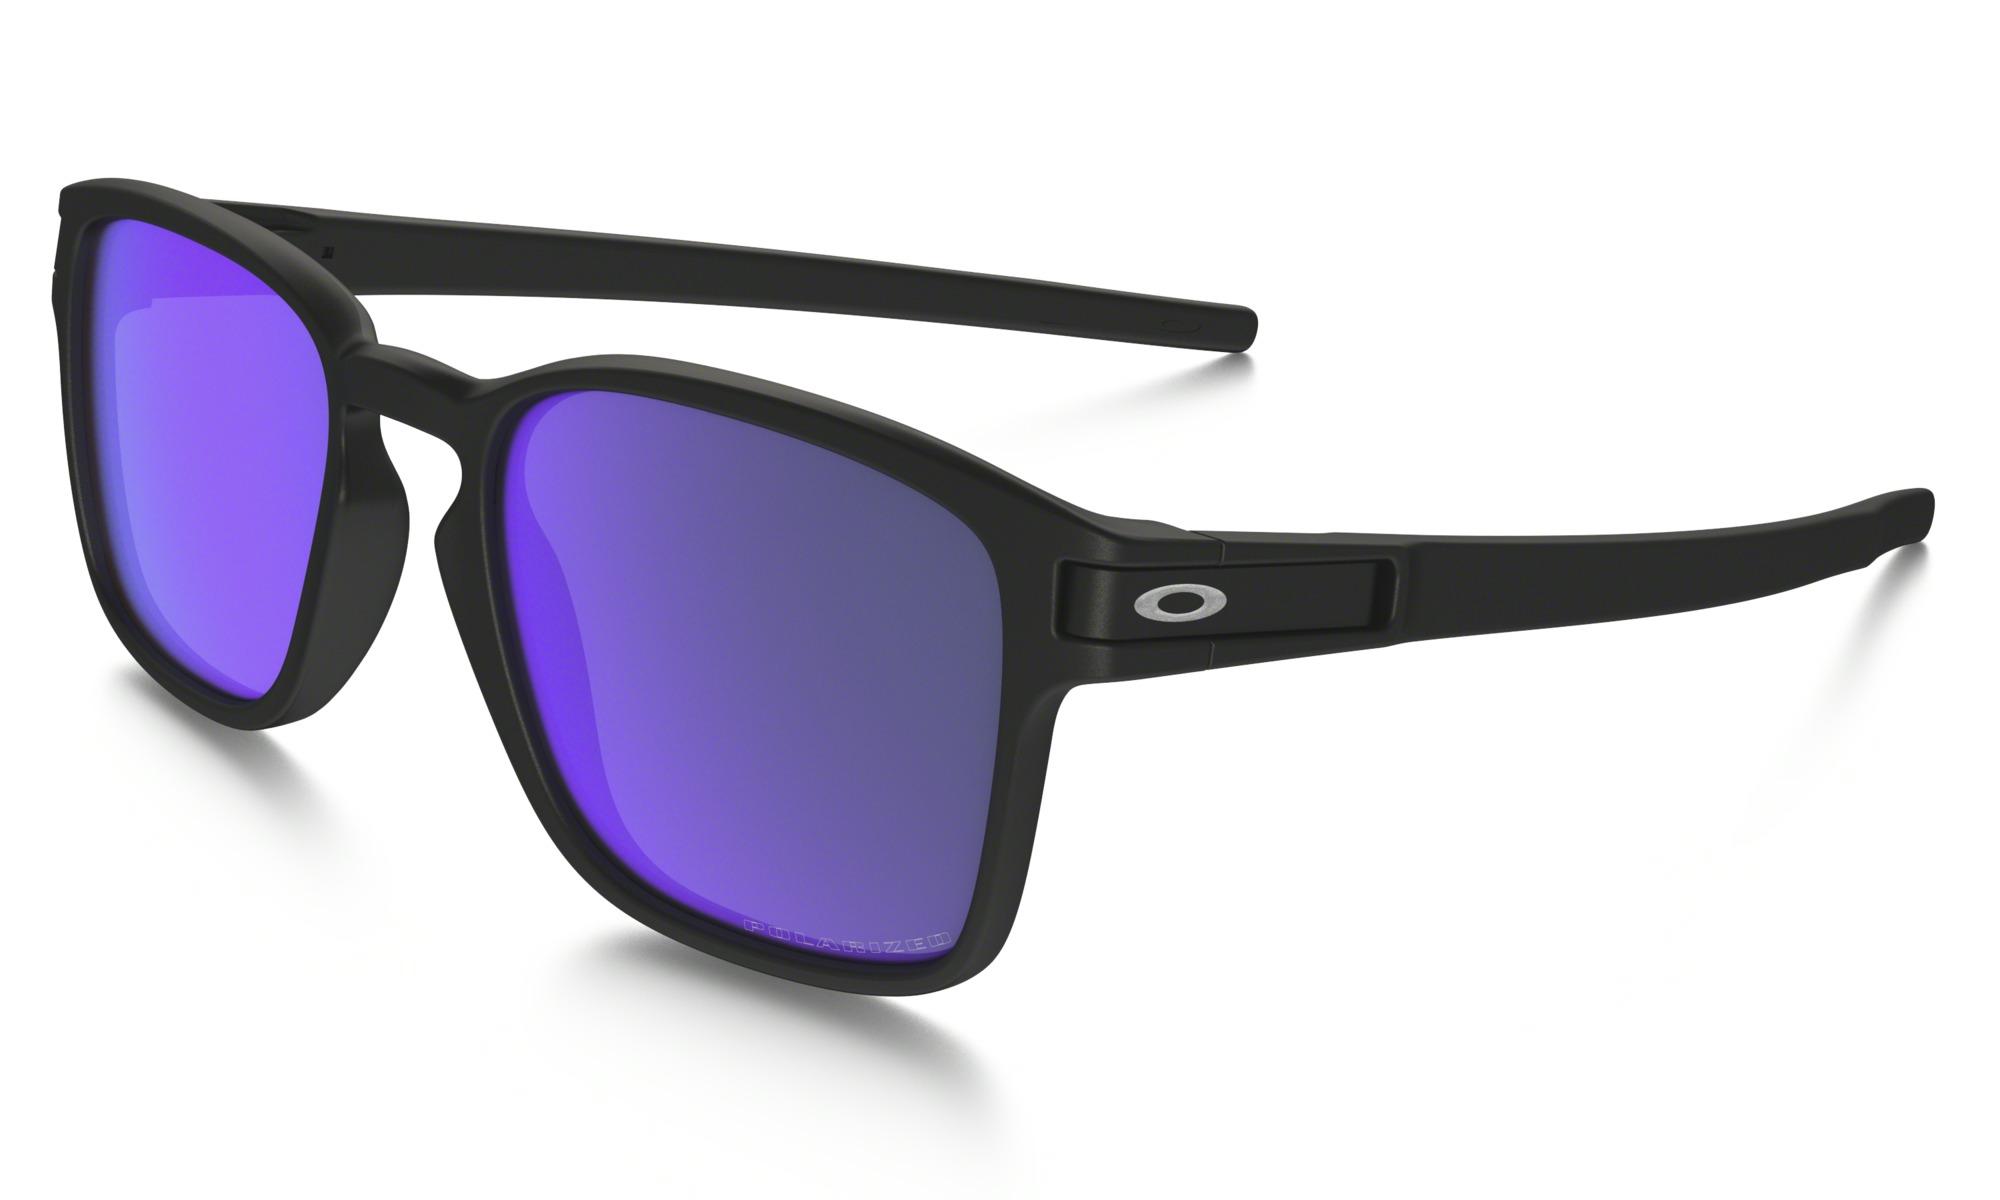 Oakley Latch SQ Iridium Polarized Sonnenbrille Klar CjKG3